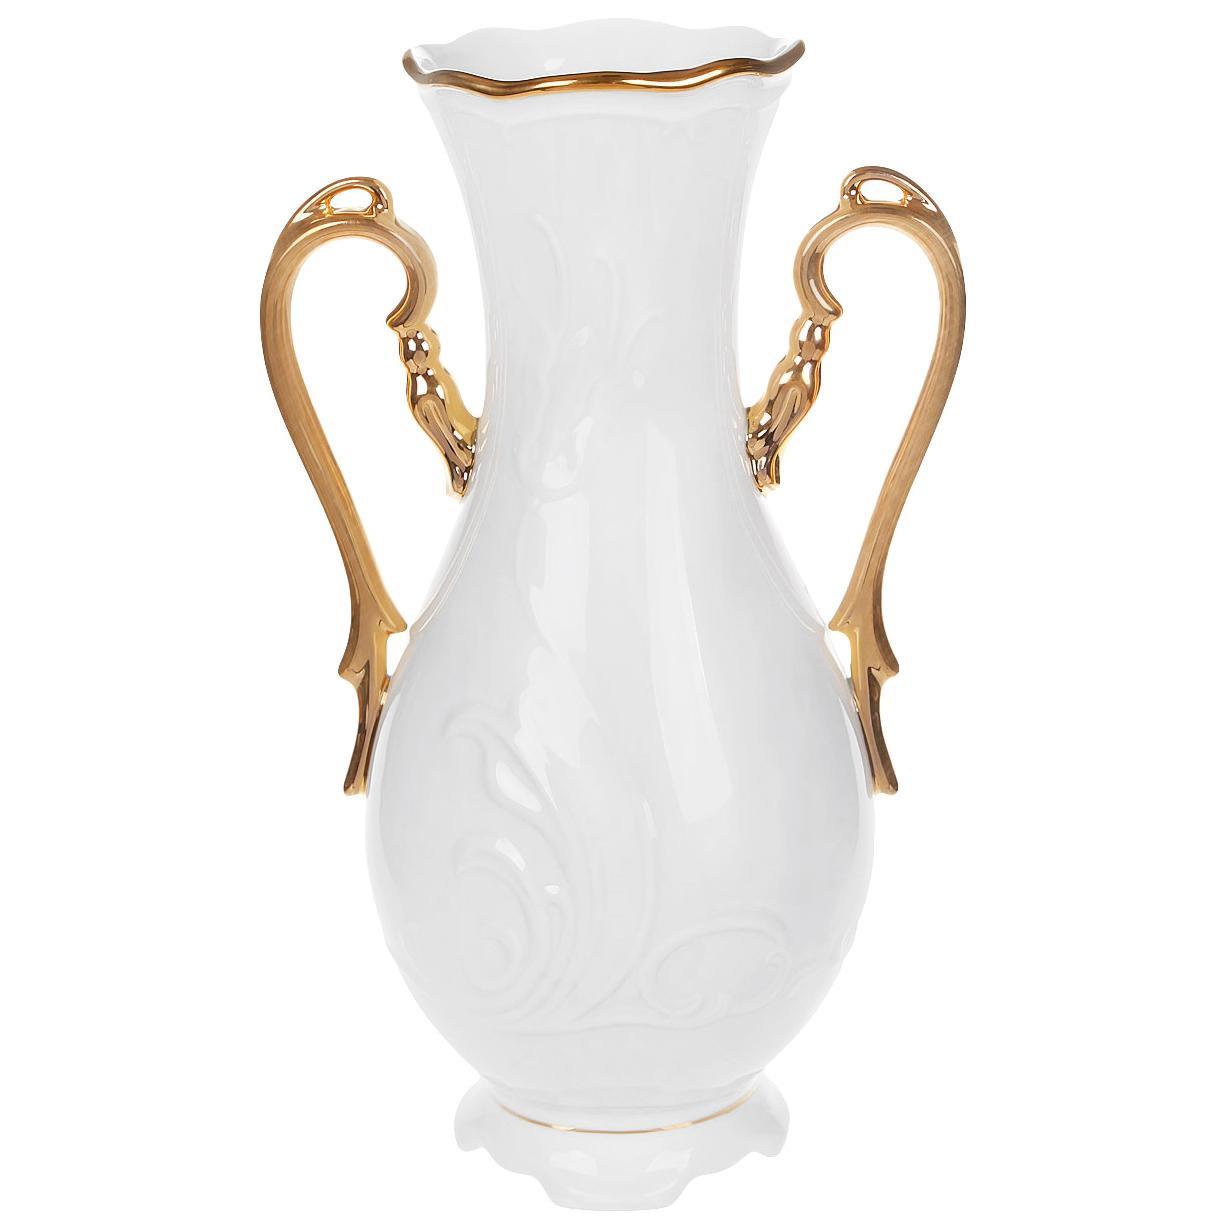 ваза thun ваза Ваза Thun Tulip Белоснежный тюльпан 30 см